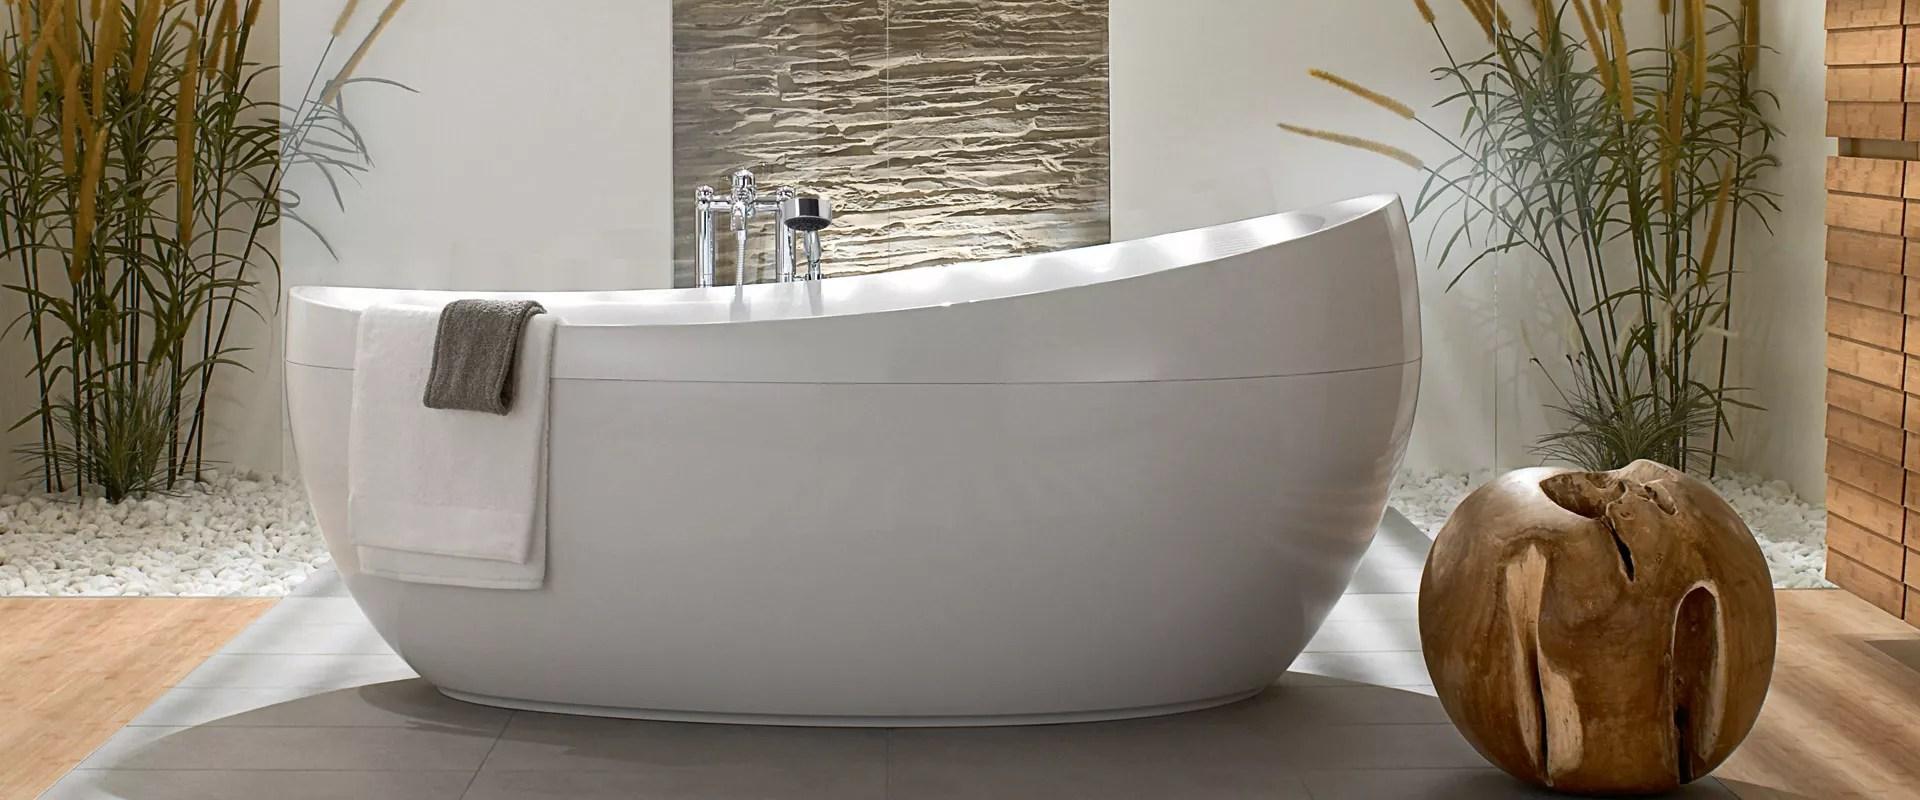 Bathroom Design Planner Online